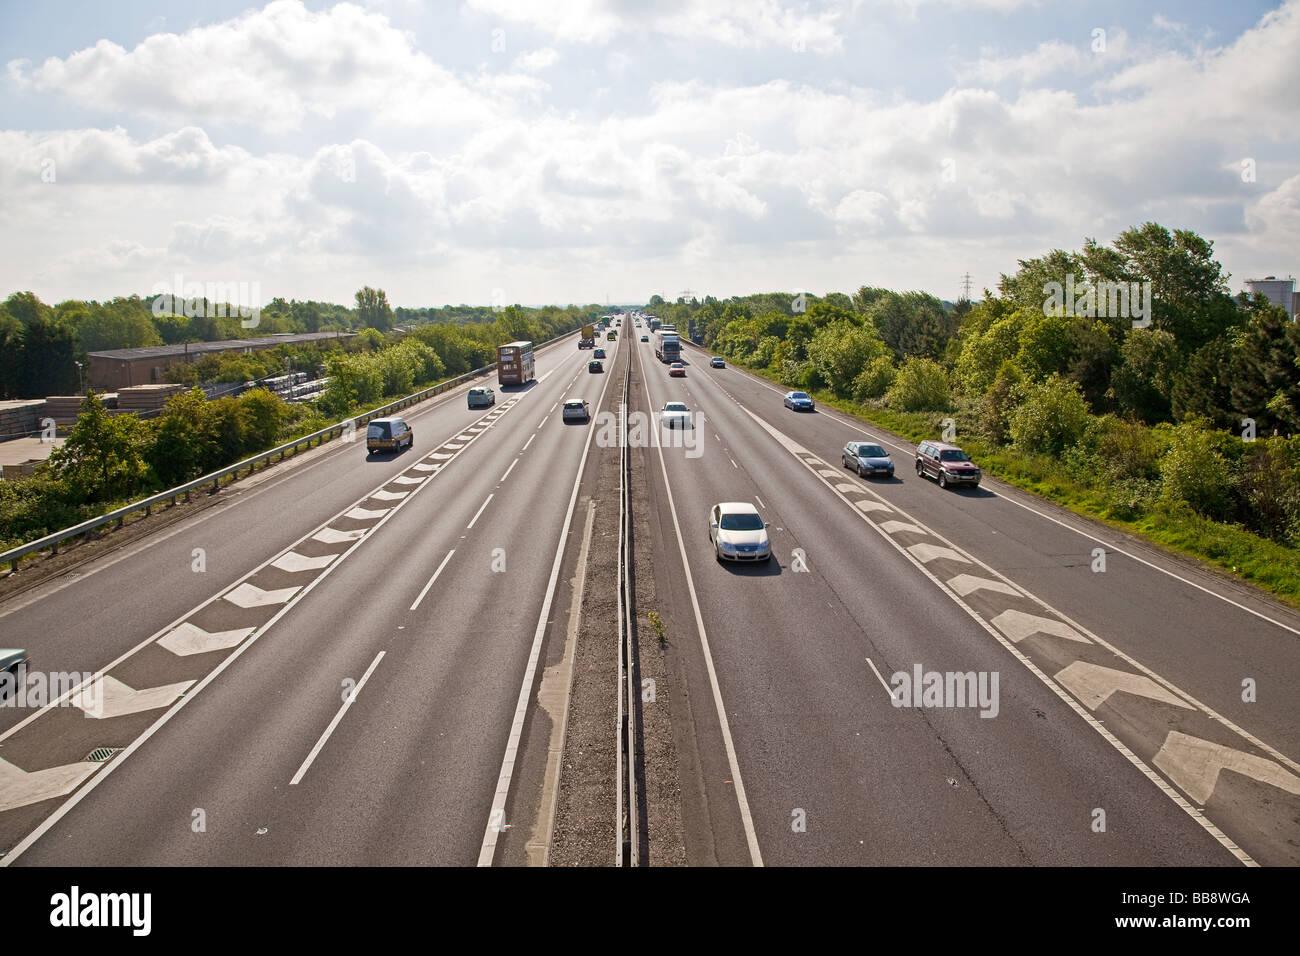 a14-looking-east-milton-cambridge-england-BB8WGA.jpg